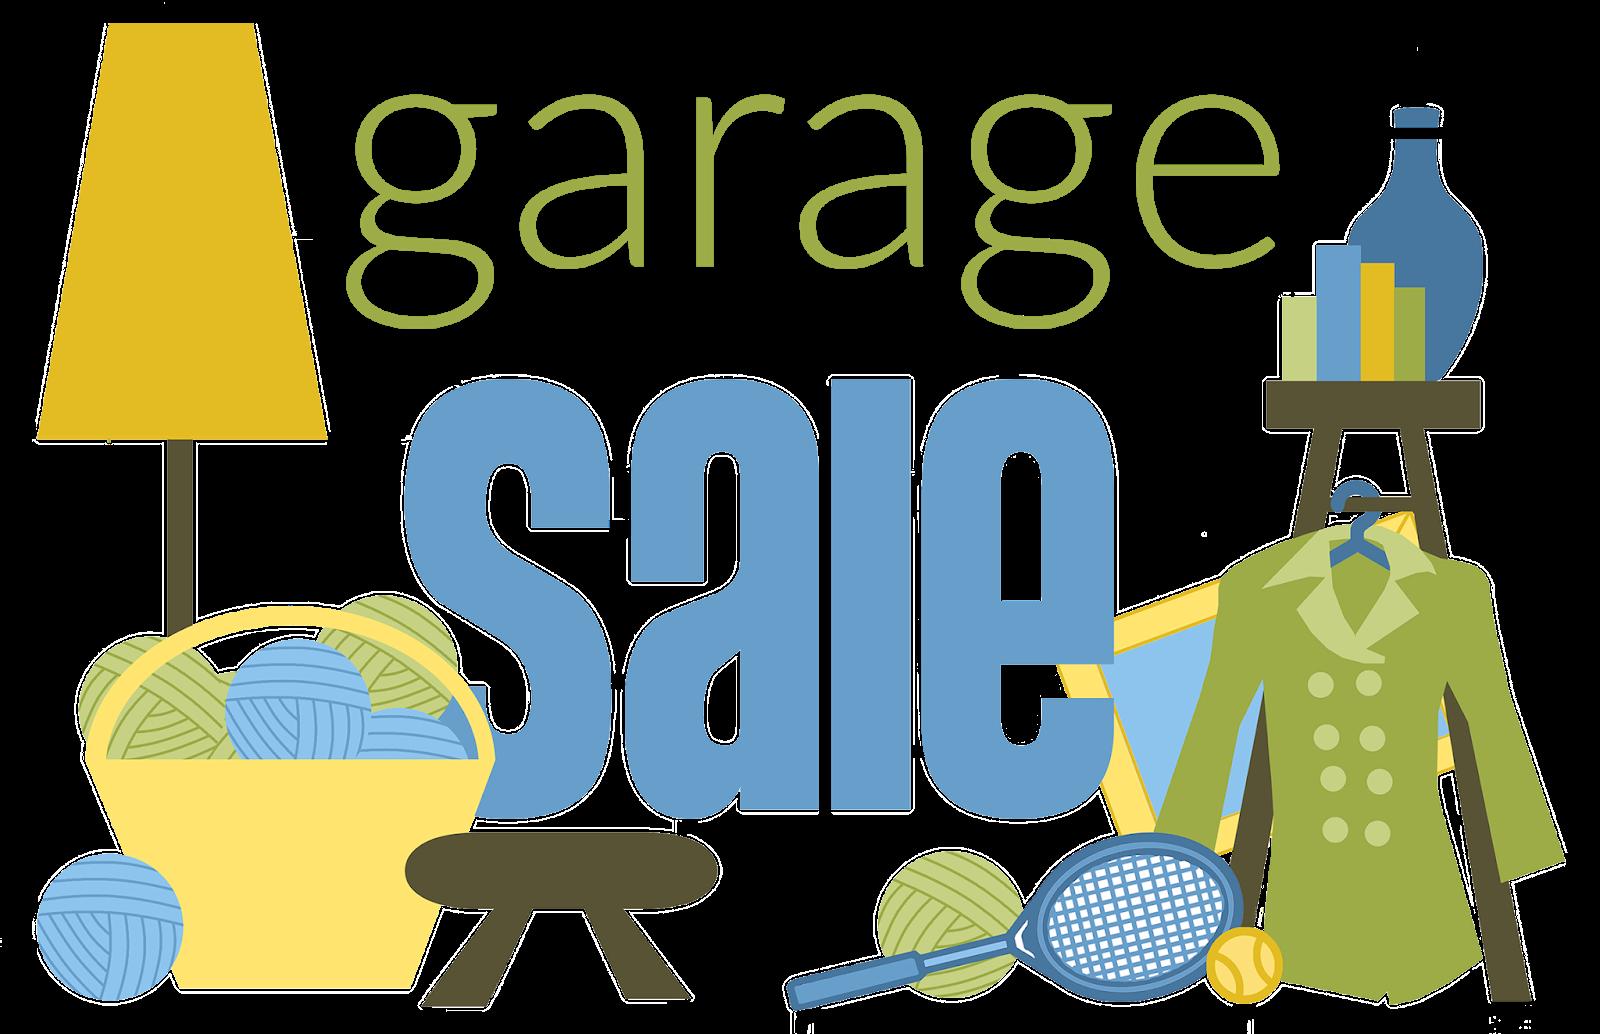 download large image garage sale yard sale signs clipart [ 1600 x 1034 Pixel ]